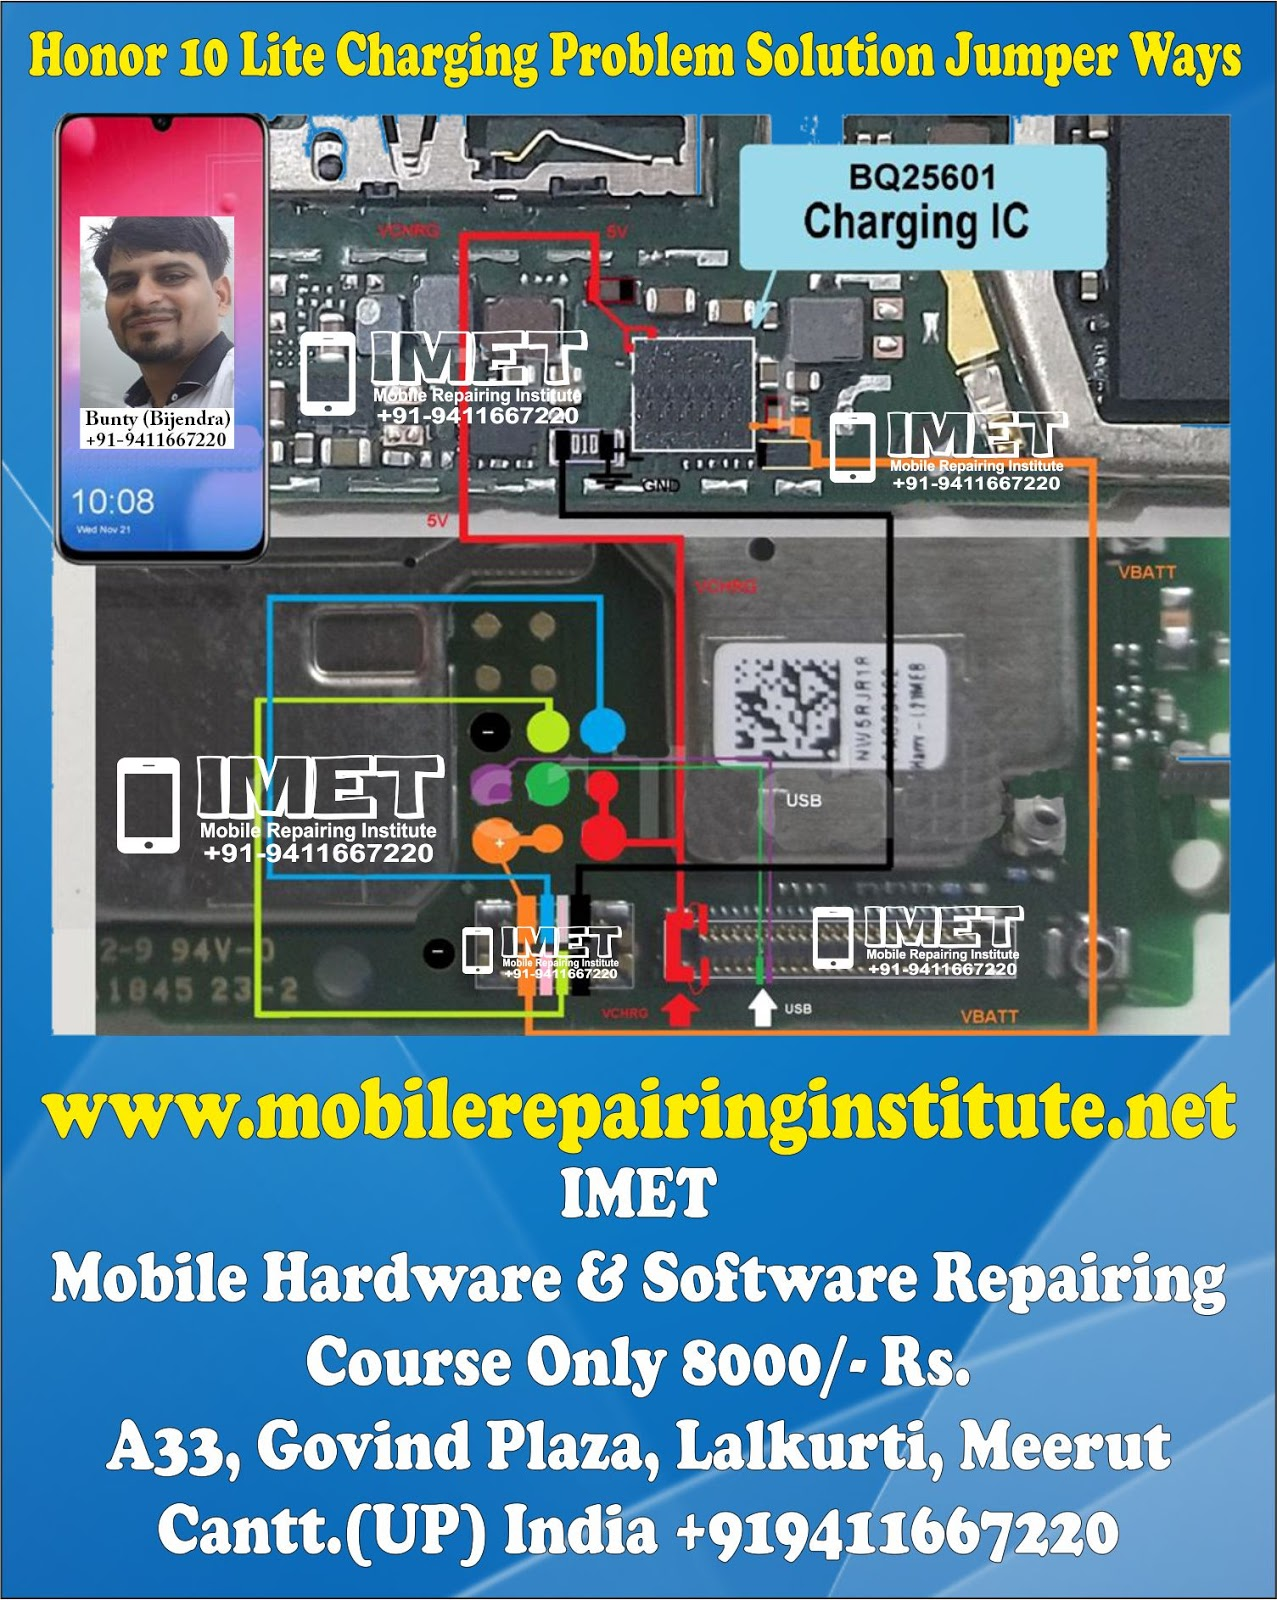 Honor 10 Lite Charging Problem Solution Jumper Ways